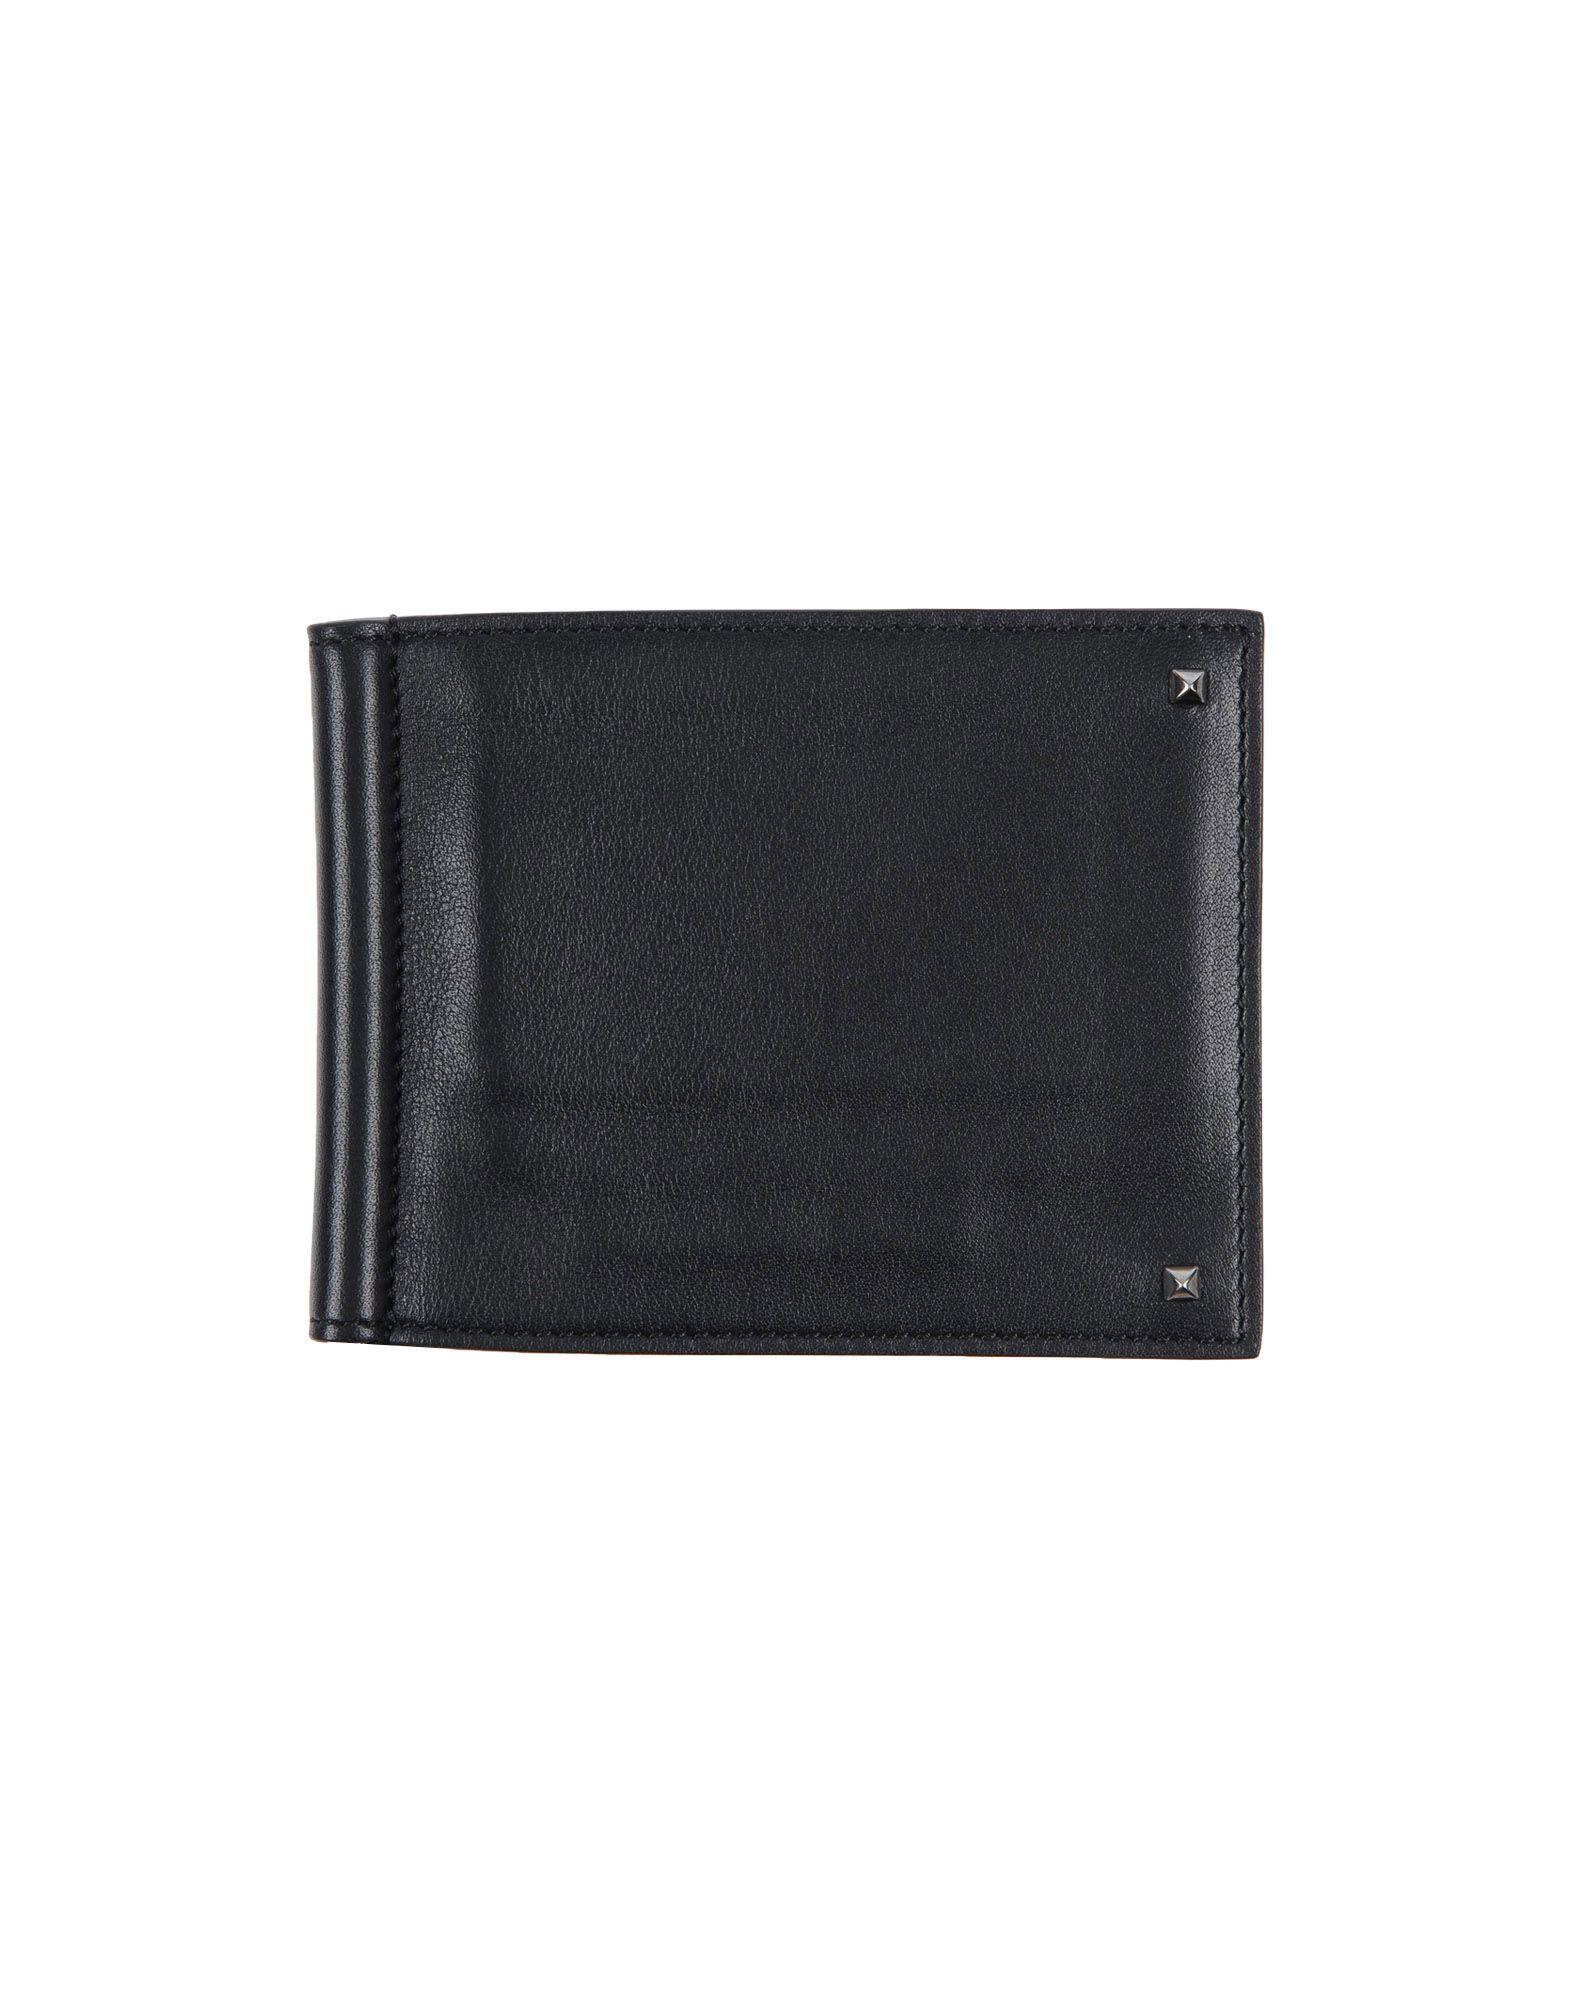 Thom Browne Small Leather Goods - Key rings su YOOX.COM GvmLbT